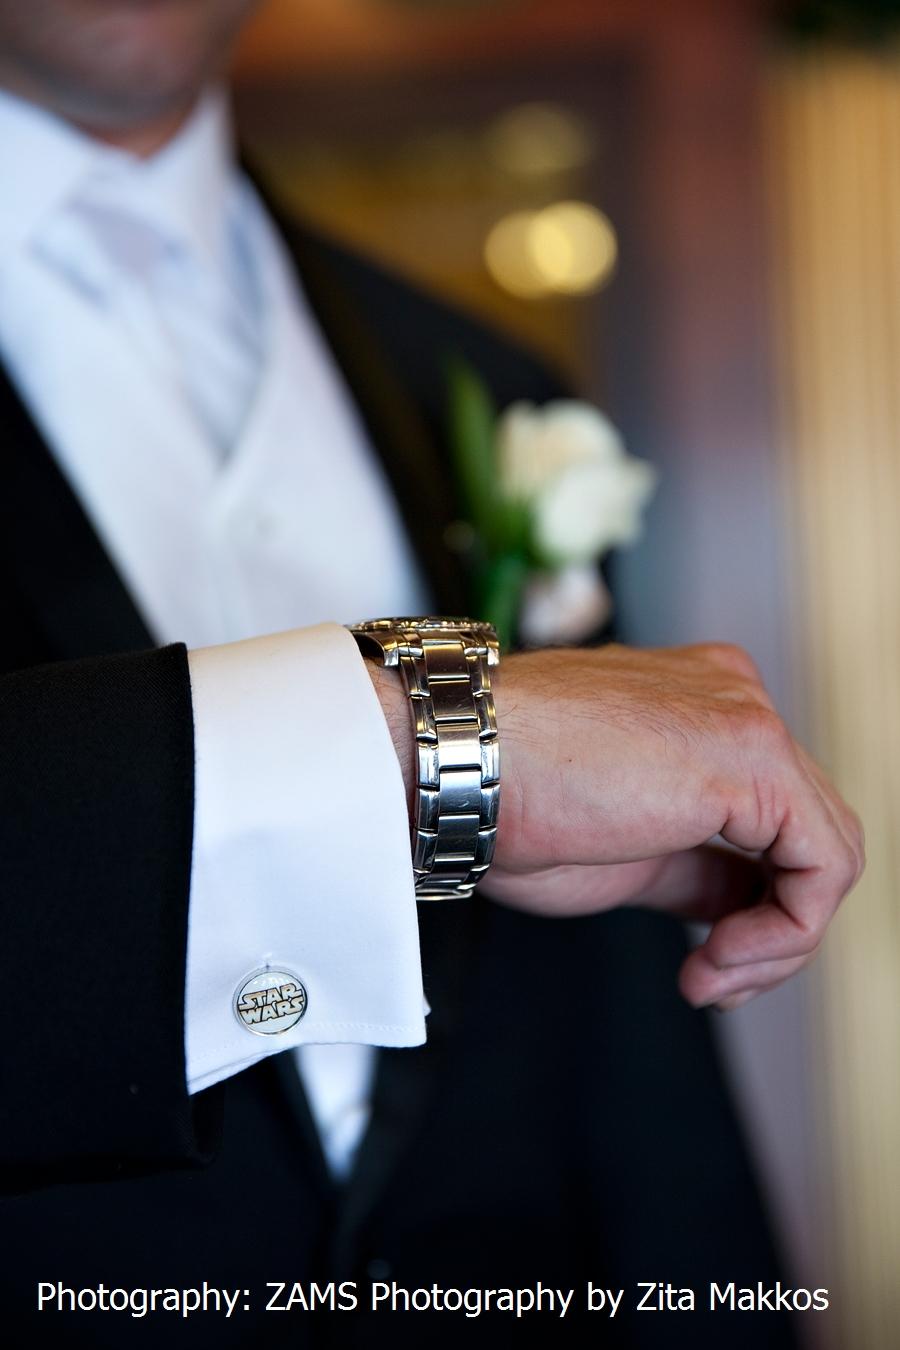 motley_crue_logo_nikki_sixx_band_cuff_links_men_weddings_gifts_groomsmen_groom_dads_gifts_cufflinks_4.jpg